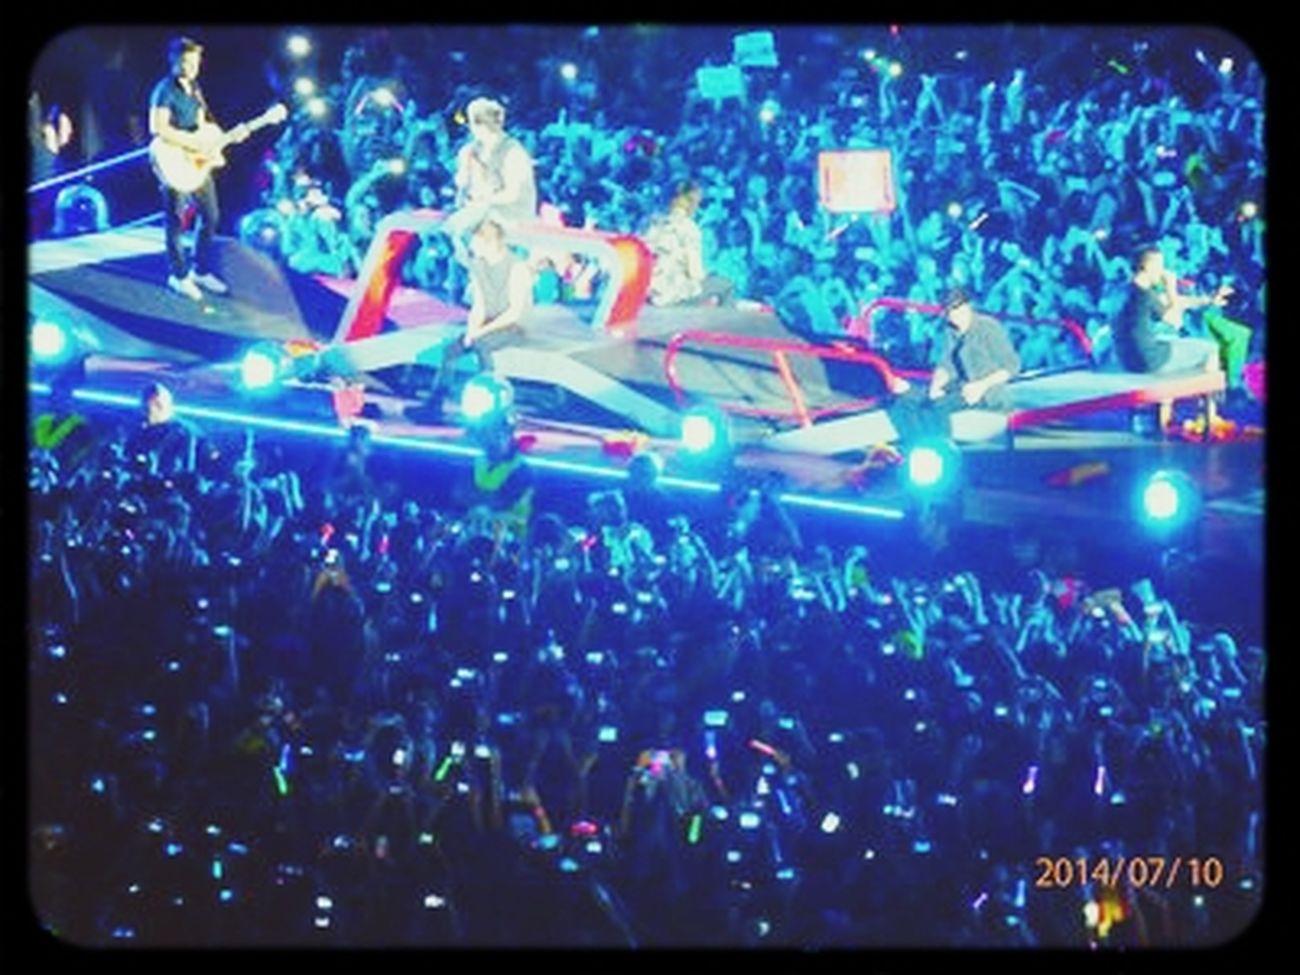 Logrado c; Madrid SPAIN ♡ One Direction ♡  With My Best Friend